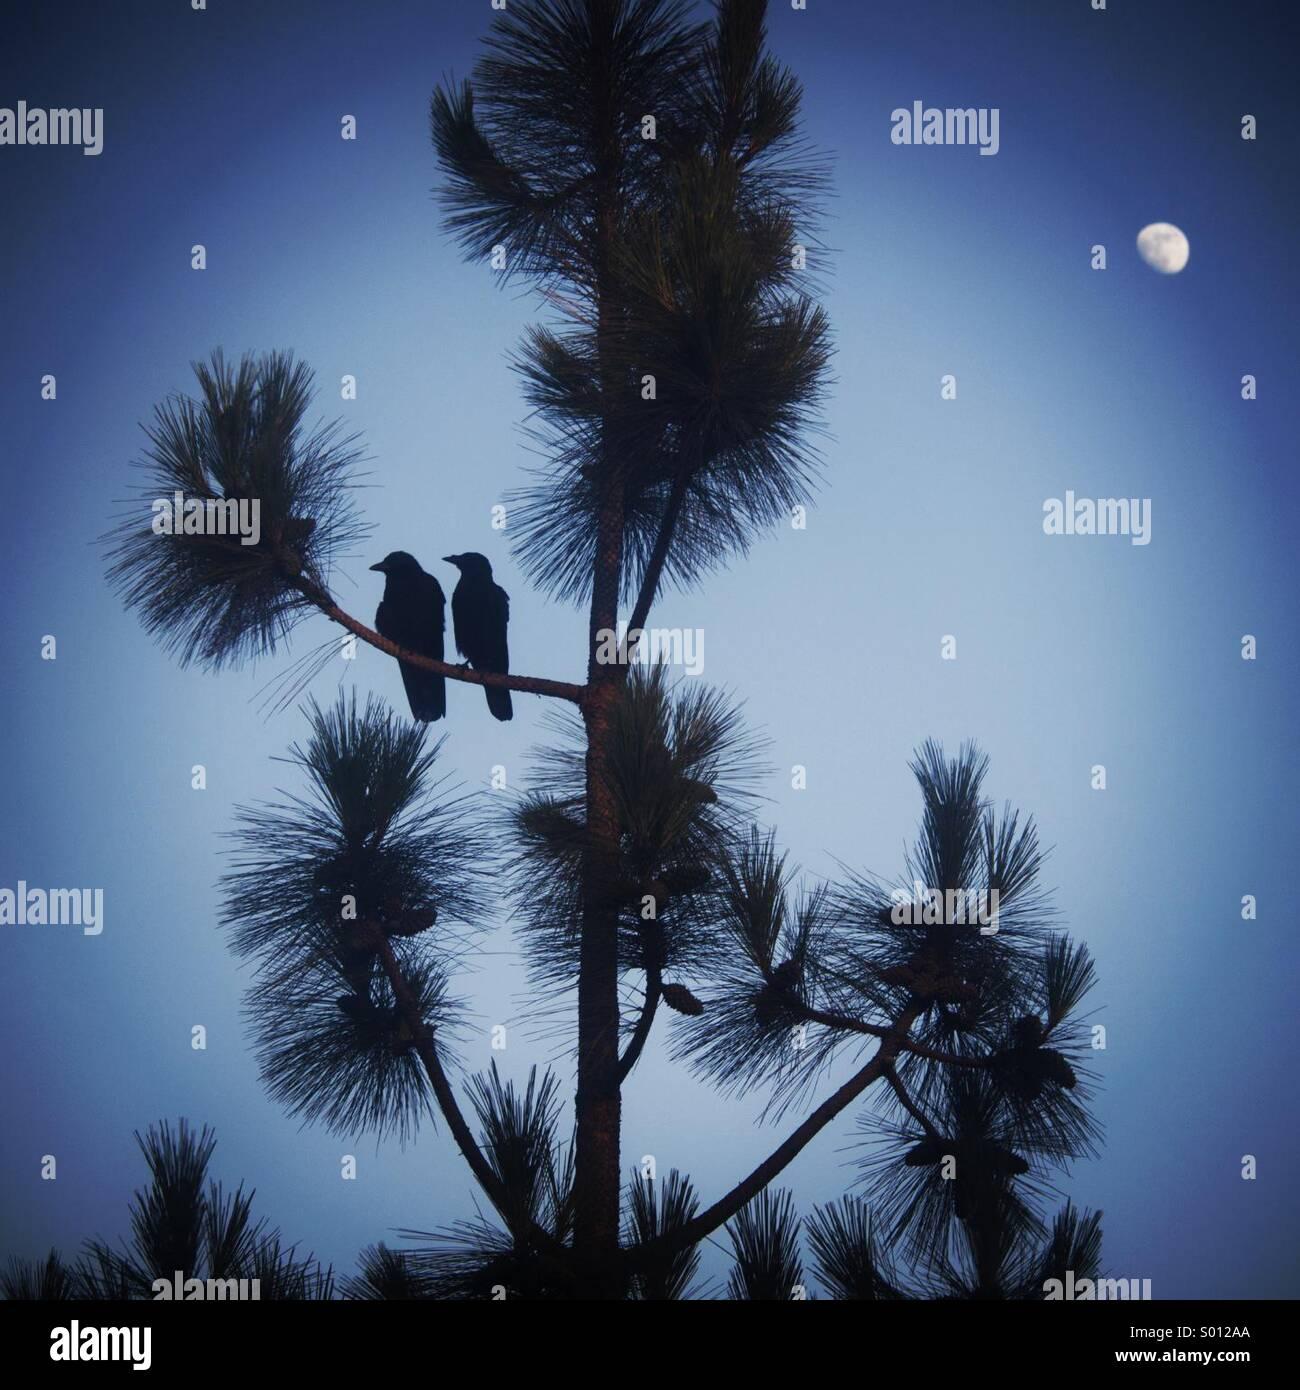 Liebe Vögel in einem Baum. Stockbild